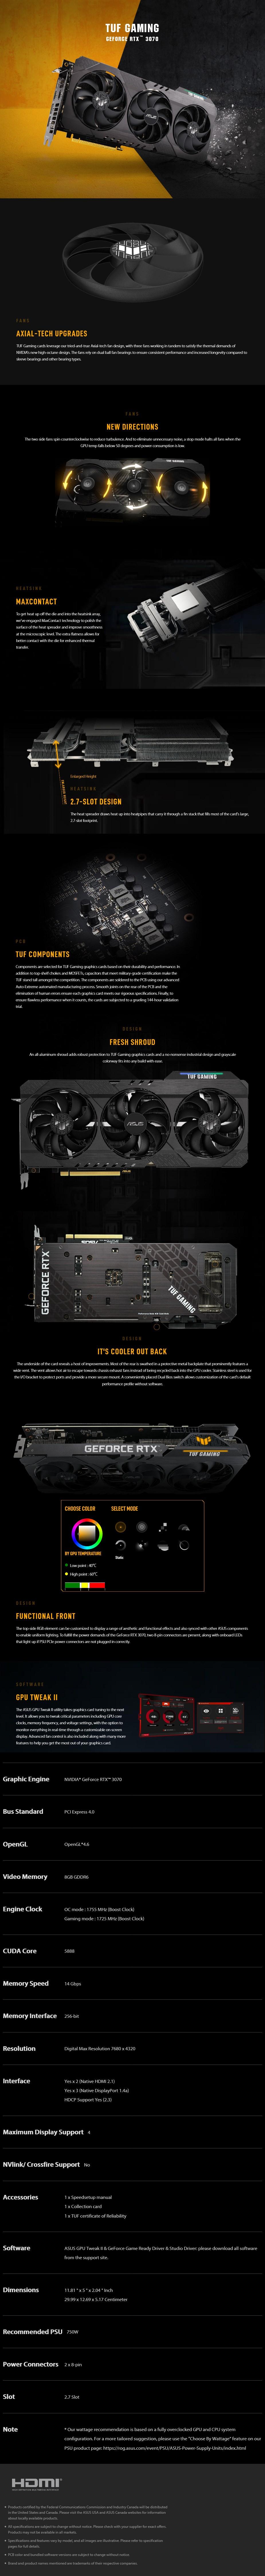 asus-geforce-rtx-3070-tuf-gaming-8gb-video-card-ac43066-1.jpg